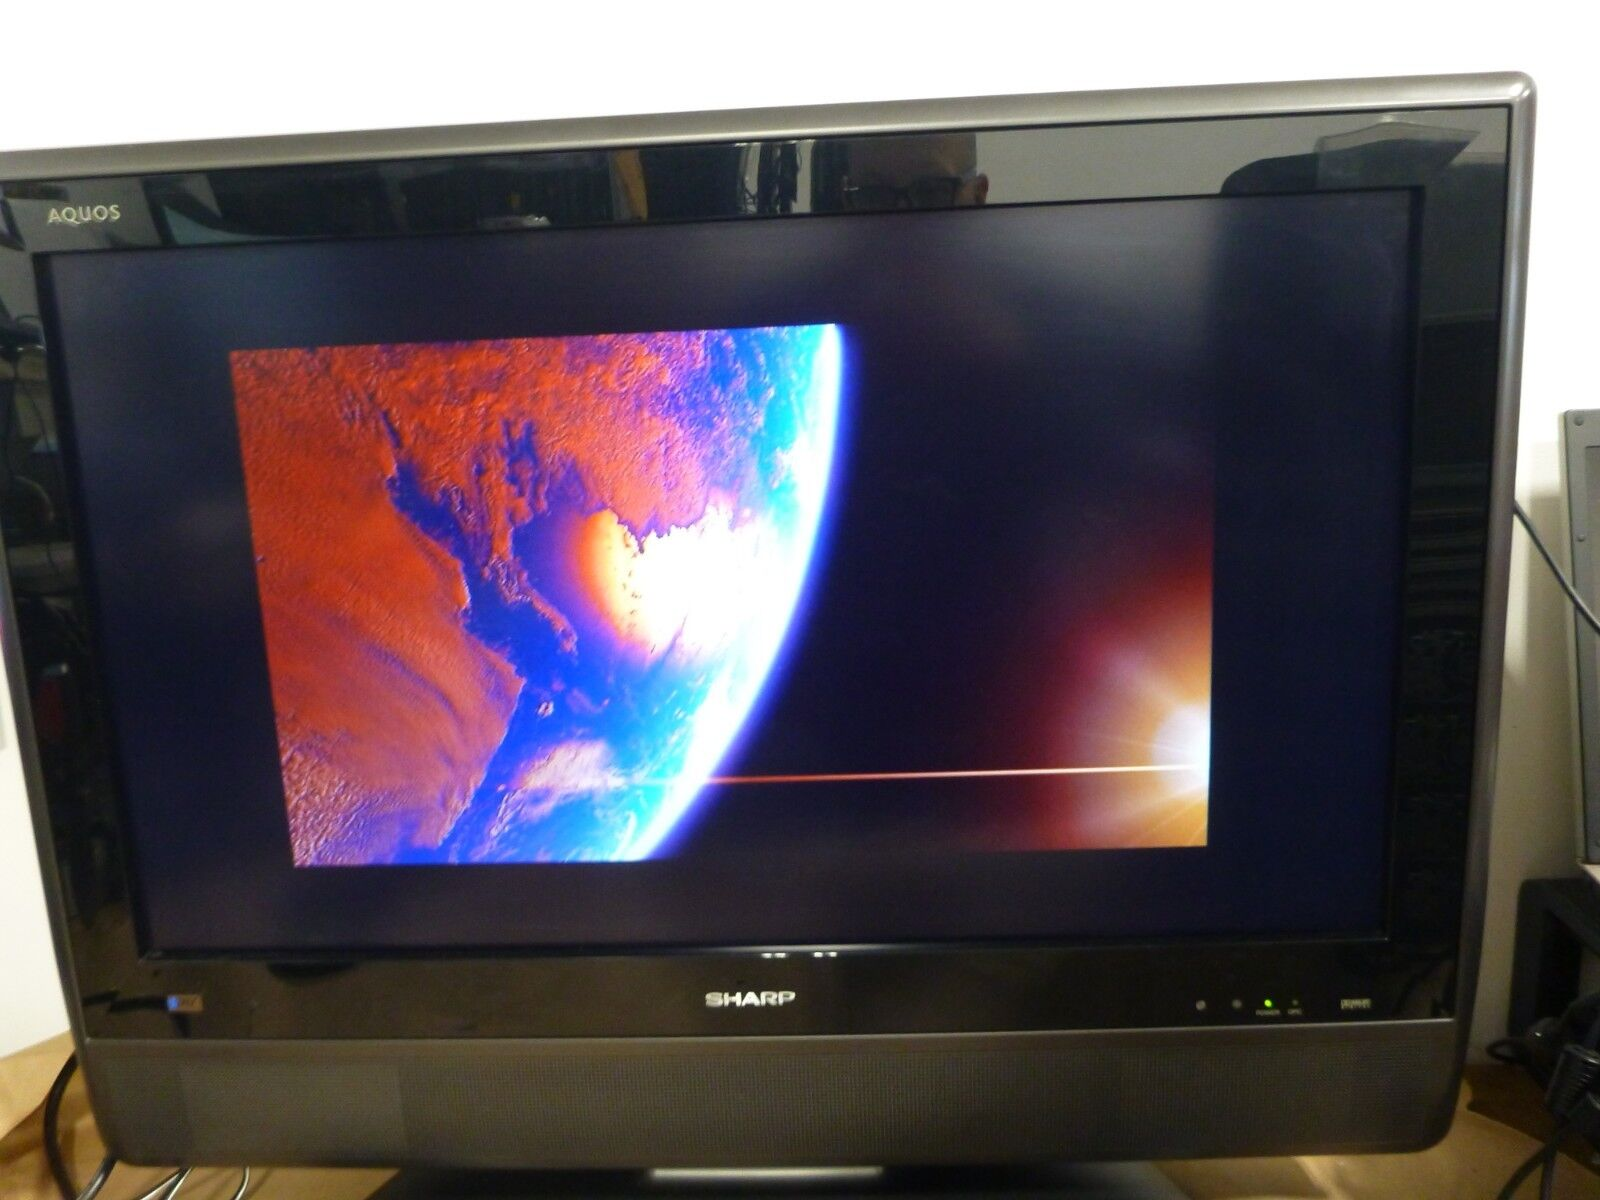 "Sharp Aquos 32"" TELEVISION TV Flat Panel LCD HDTV w/ HDMI x 2 (LC-32D41U)"